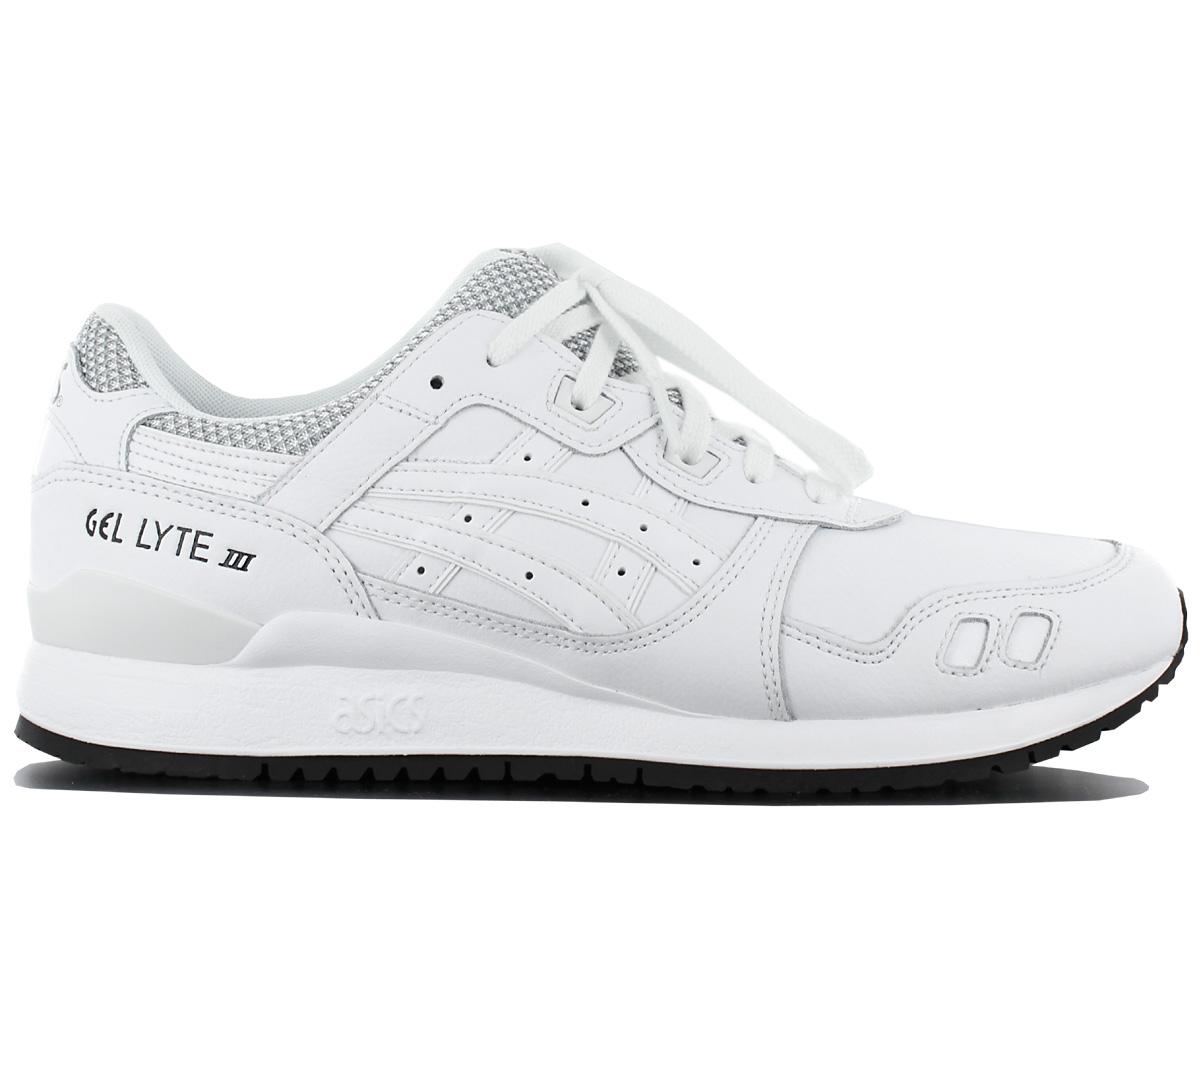 Asics Tiger Gel-Lyte Herren Sneaker Freizeit Schuhe Turnschuhe V III MT NEU SALE